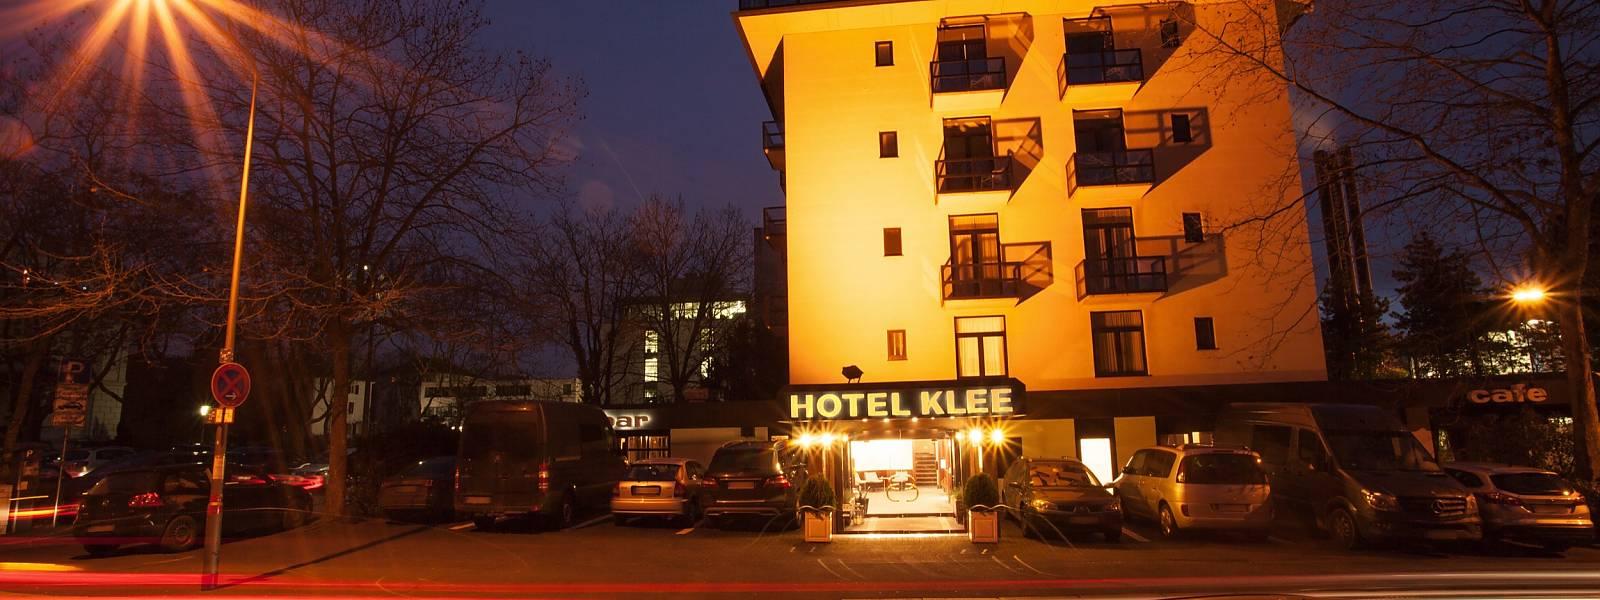 centro hotels startseite. Black Bedroom Furniture Sets. Home Design Ideas